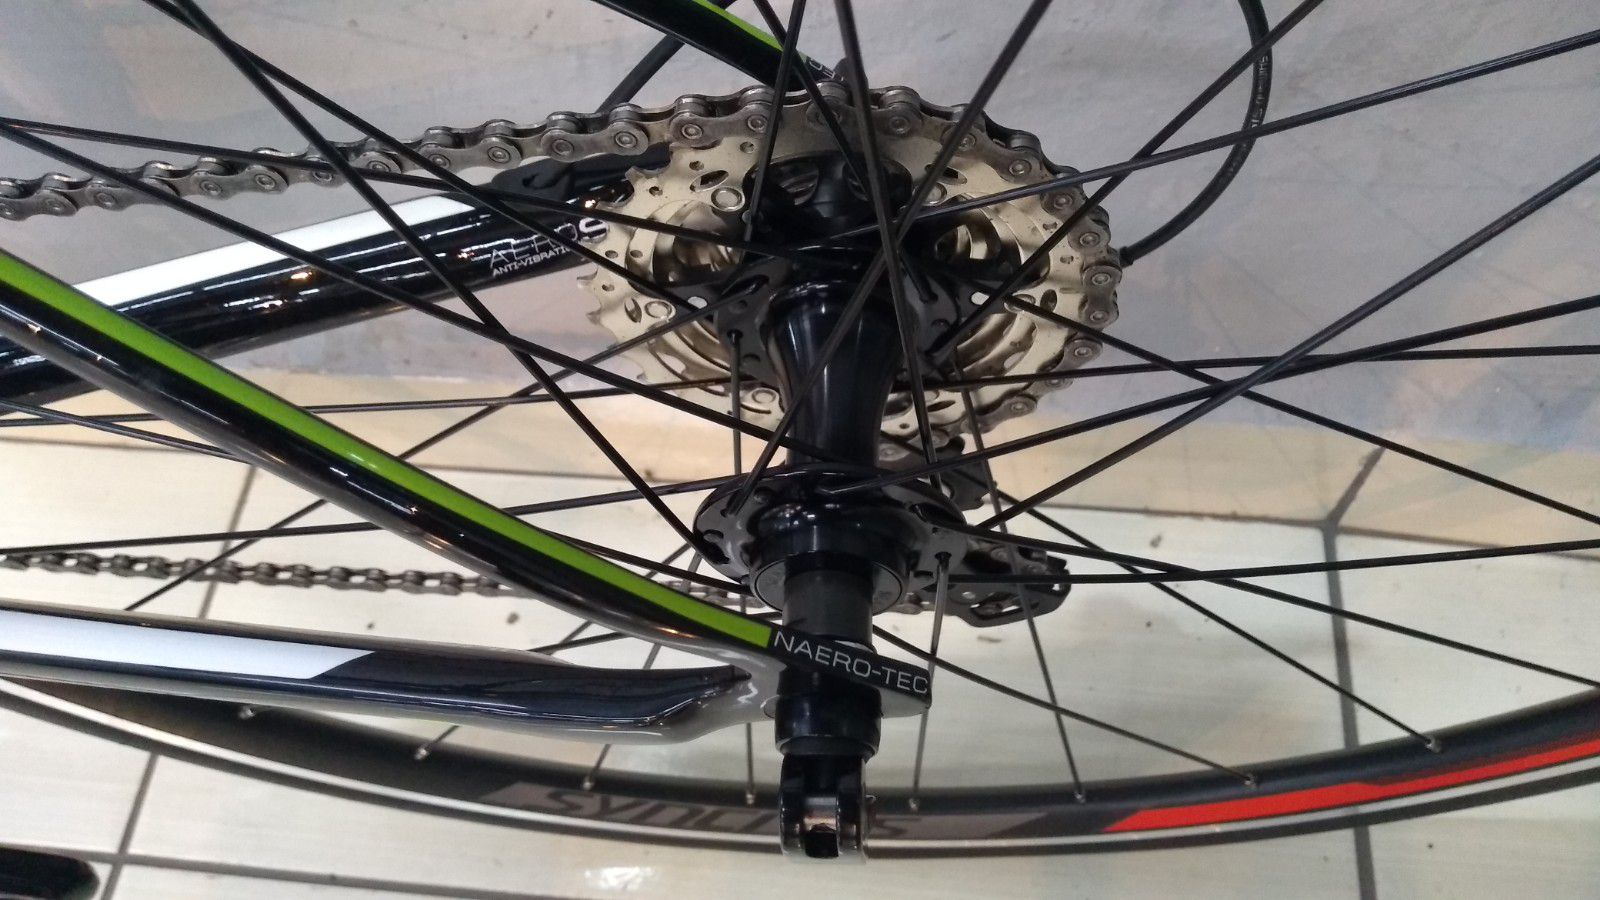 Bicicleta Cannondale Slice 105 -  tamanho 54 (produto usado)